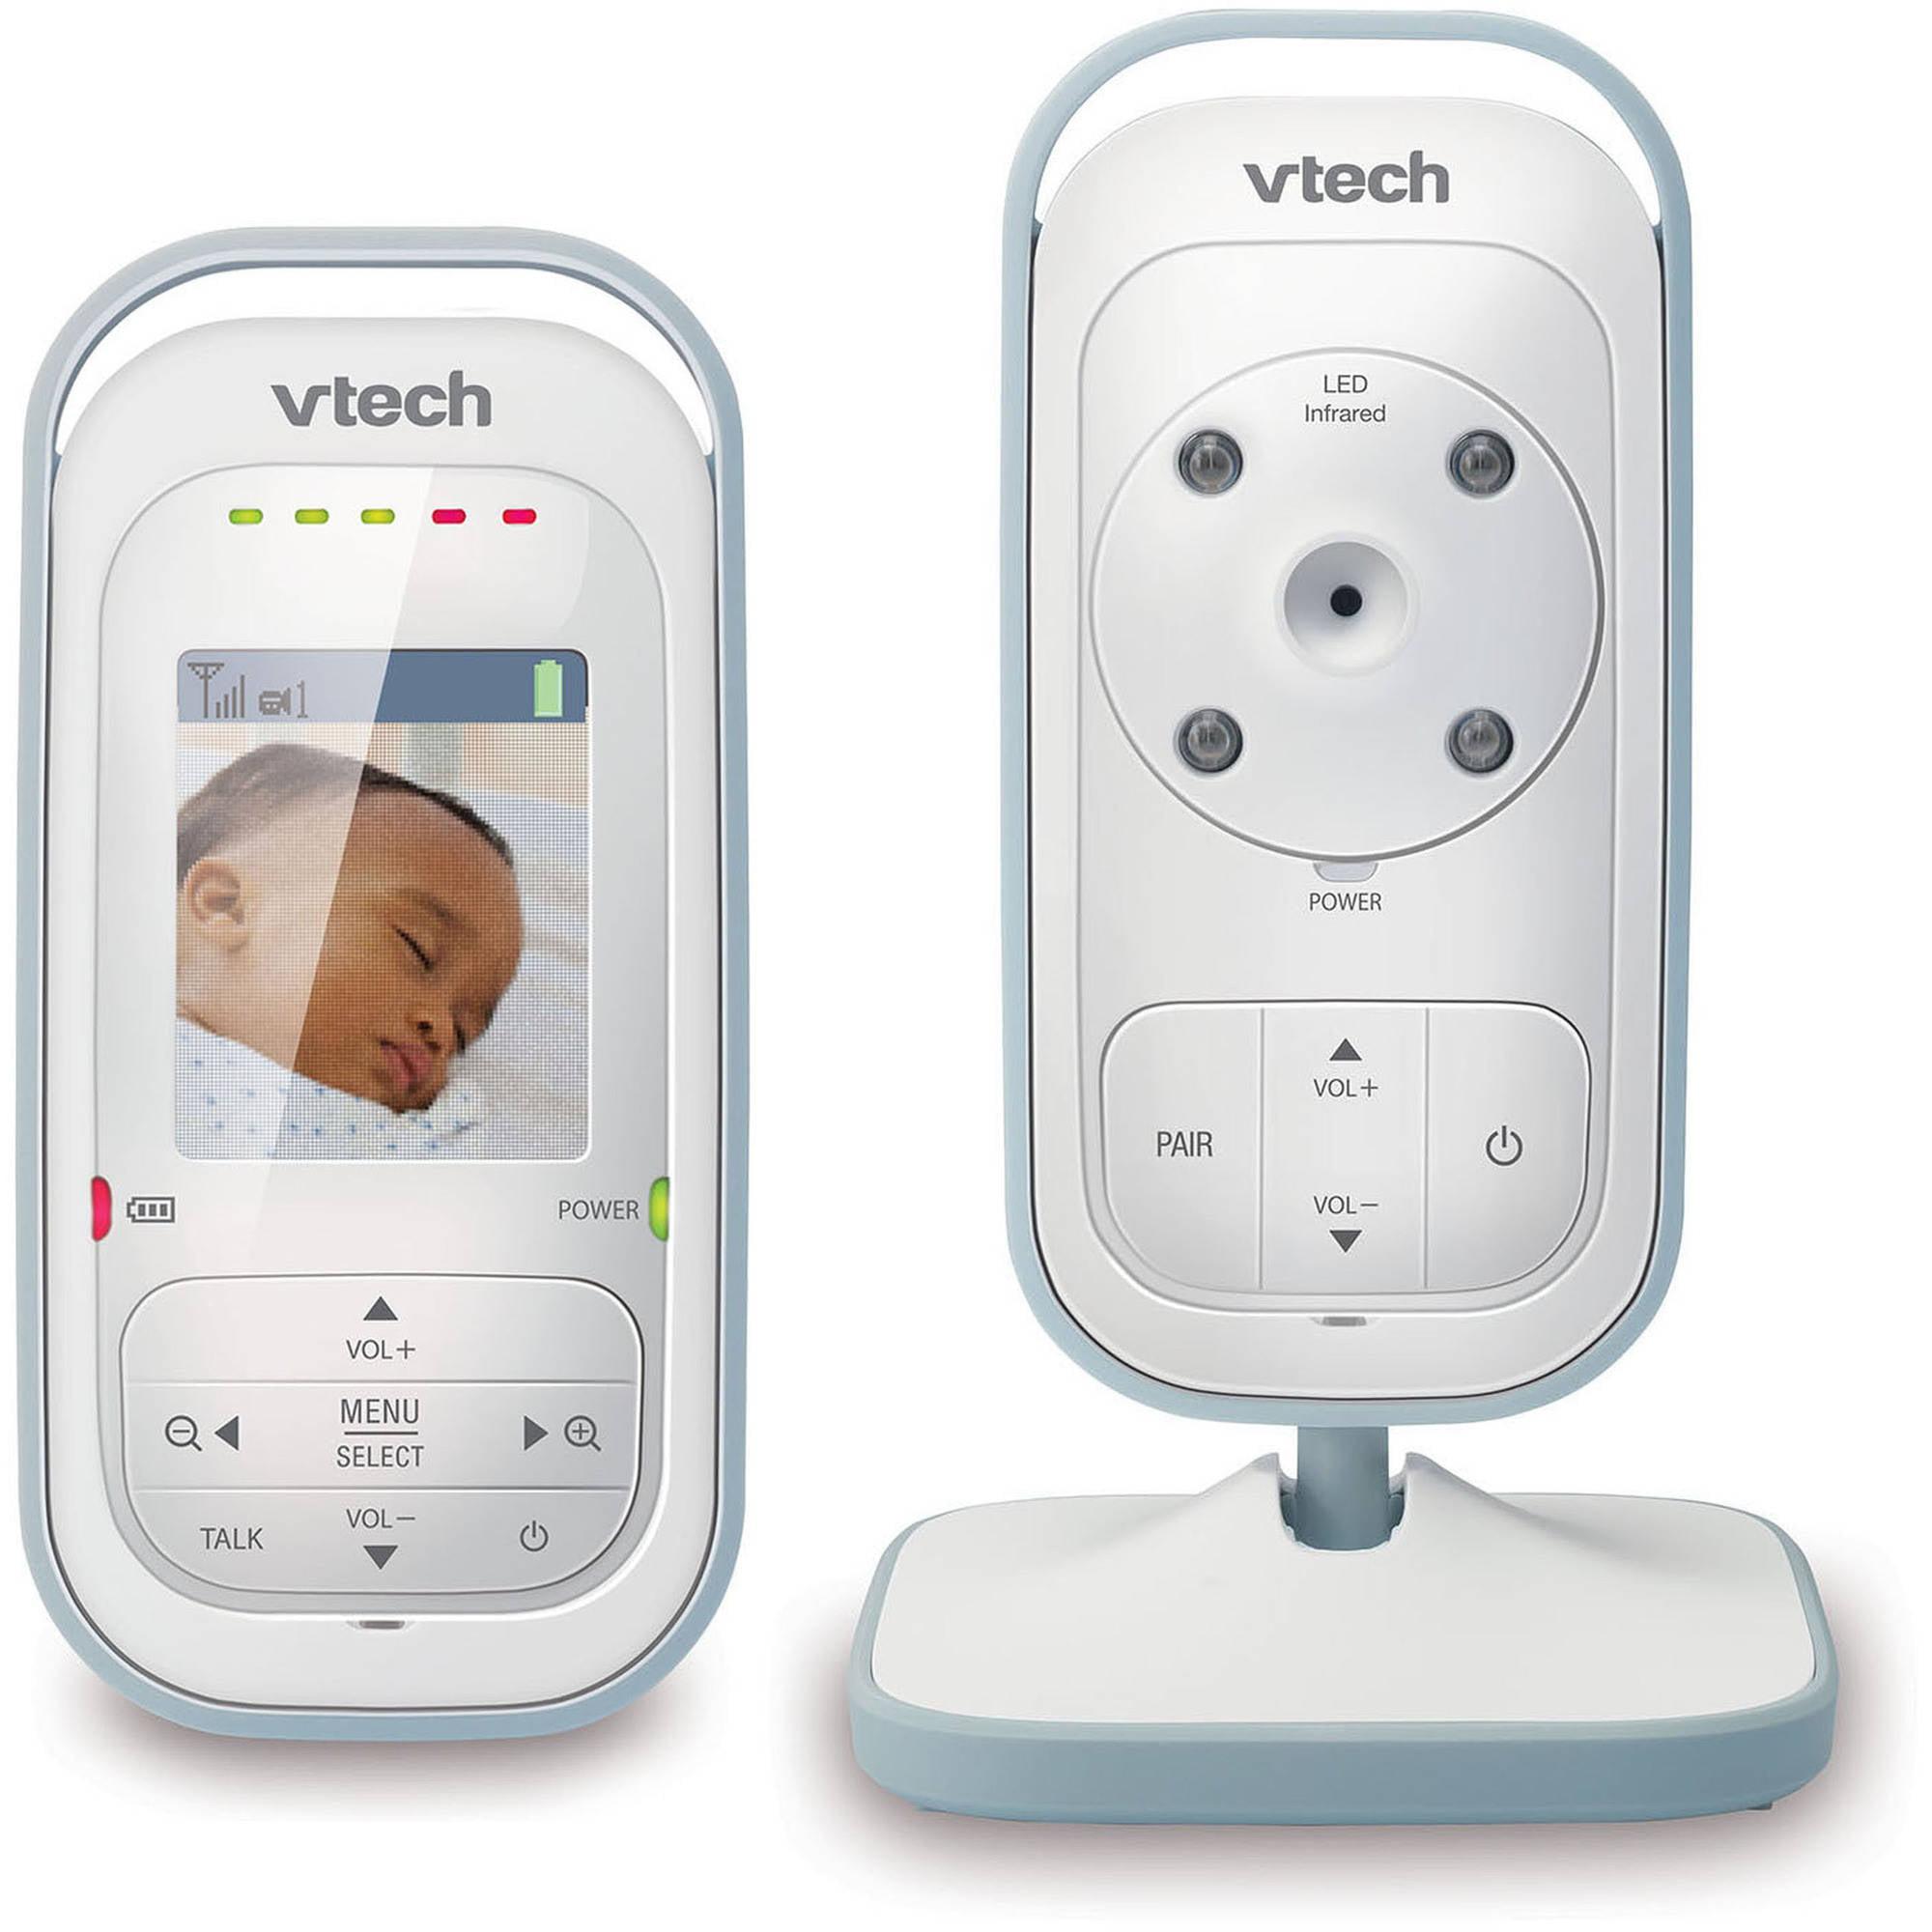 VTech VM311, Video Baby Monitor, Automatic Night Vision